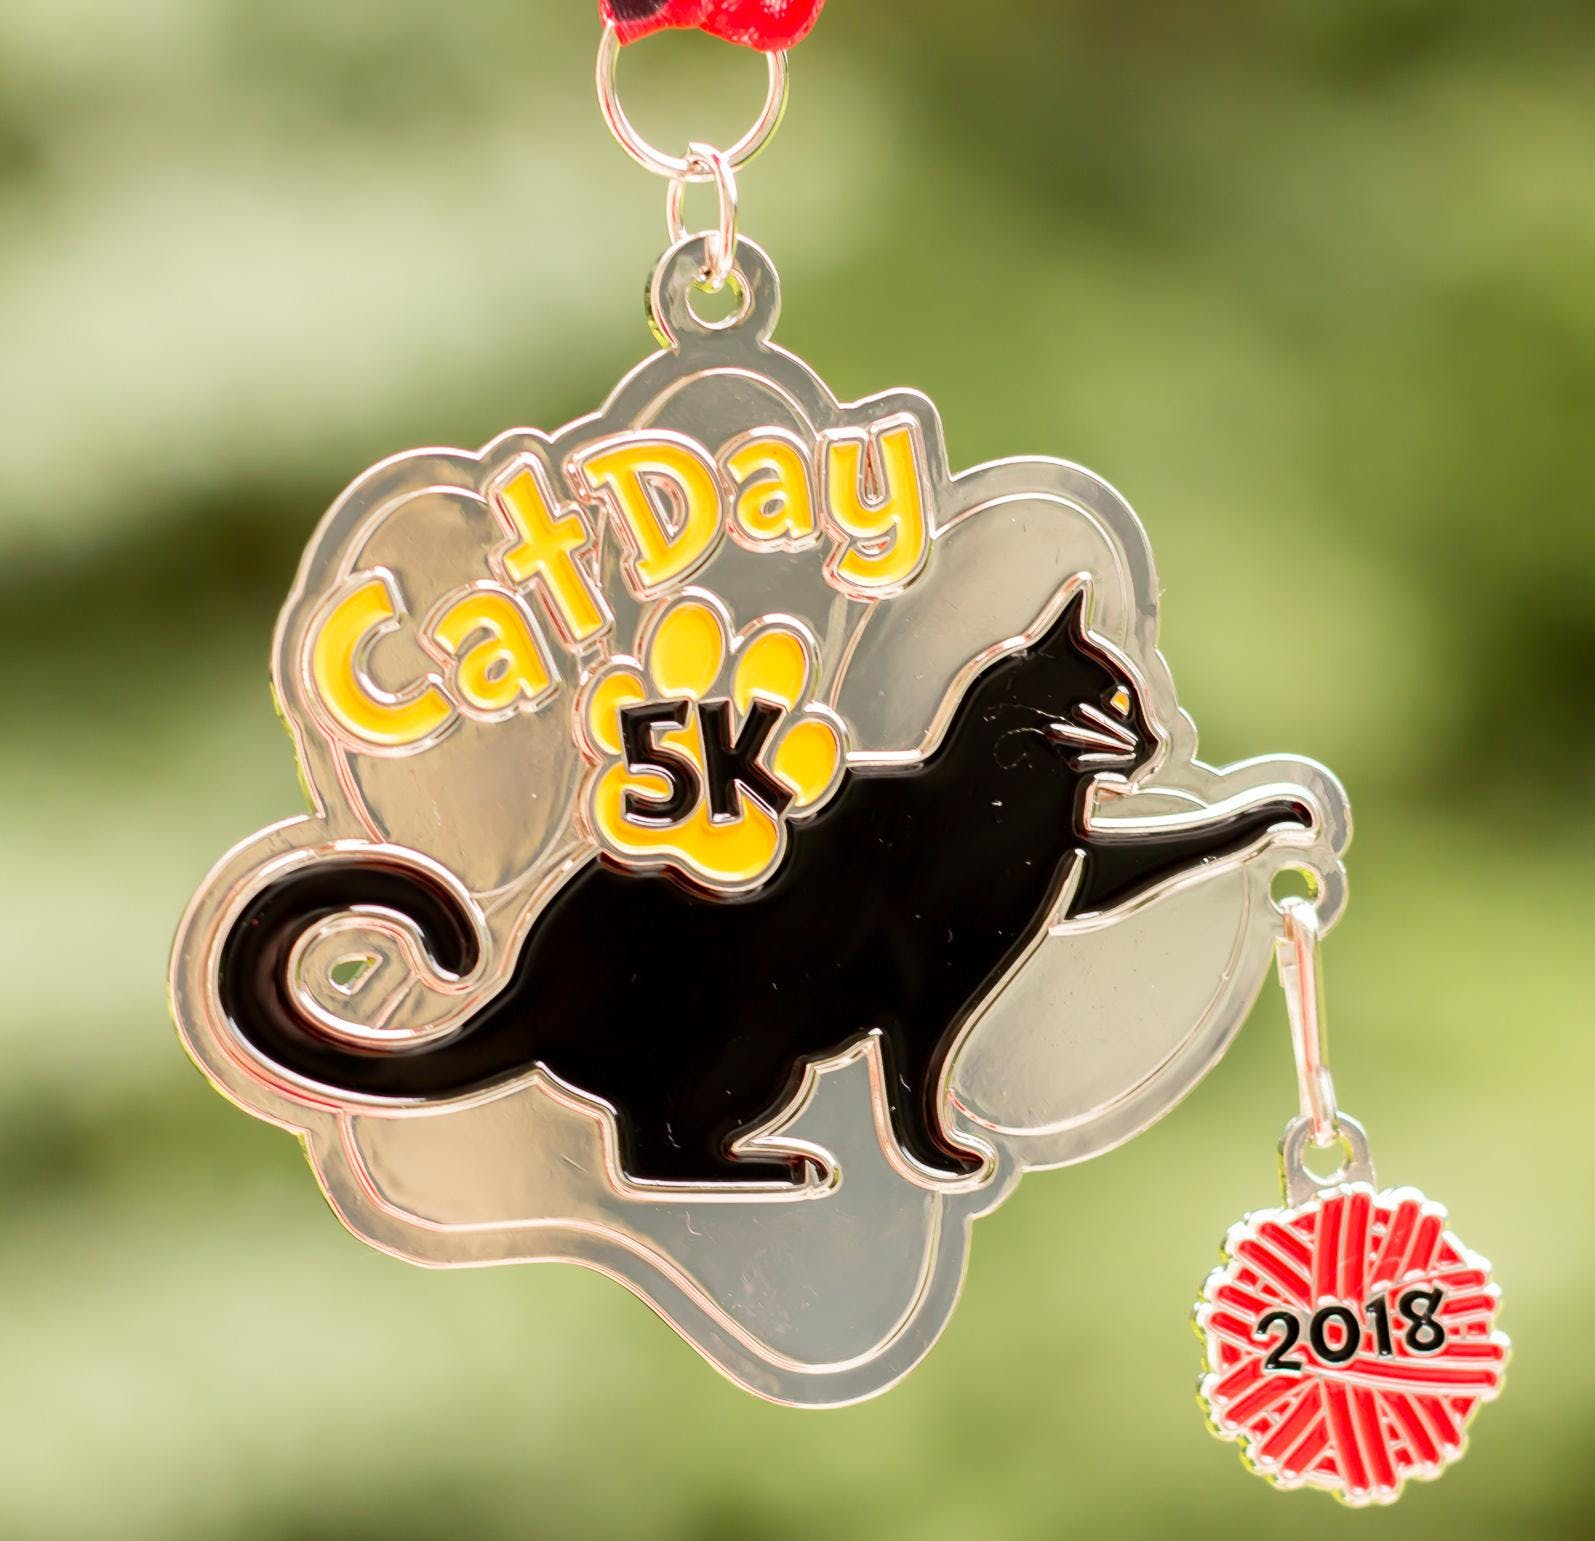 Now Only $10 Cat Day 5K & 10K -Cedar Rapids